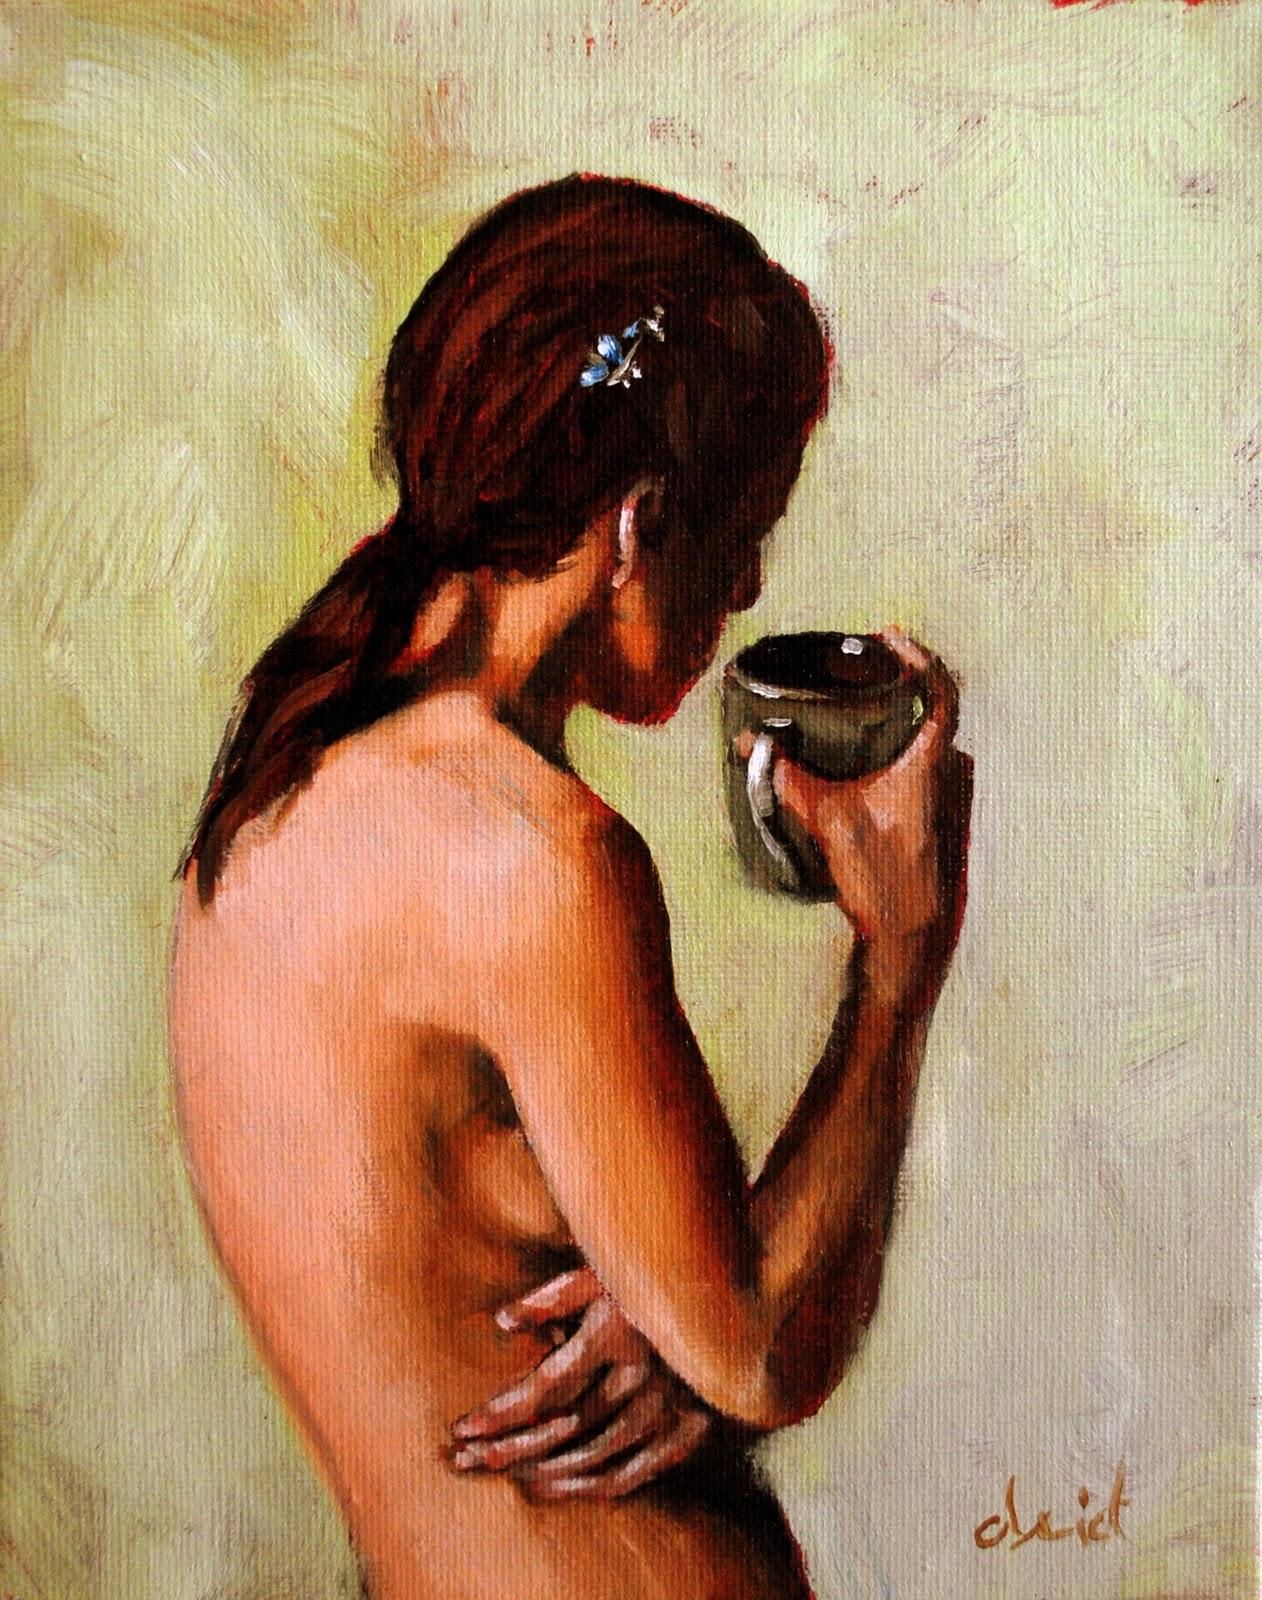 """A Cup Half Full 8x10 oil on canvas in darkwood frame"" original fine art by David Larson Evans"